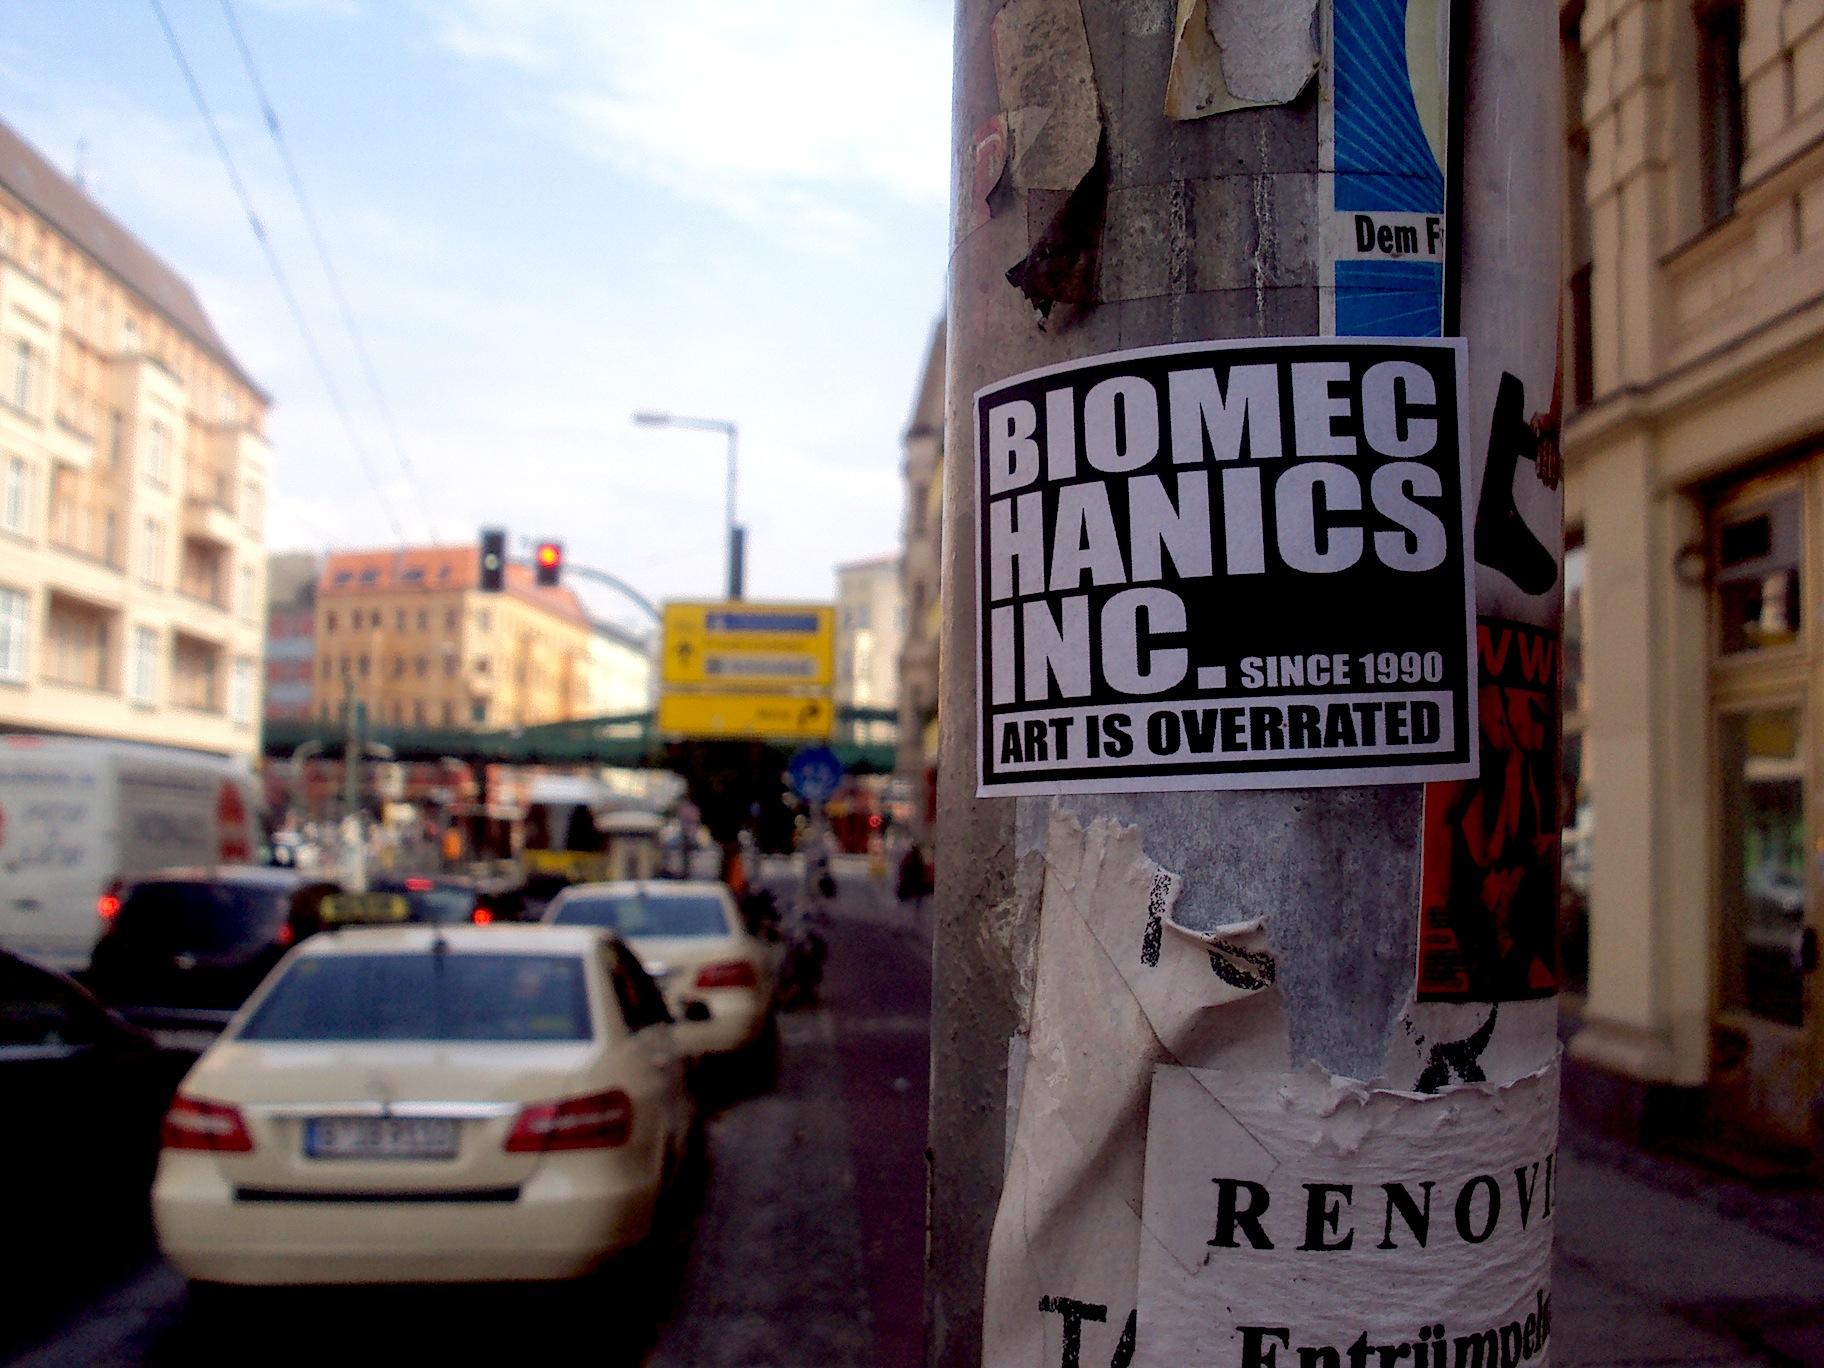 art is overrated - biomechanics inc. july 28th, Berlin, eberswalder strasse